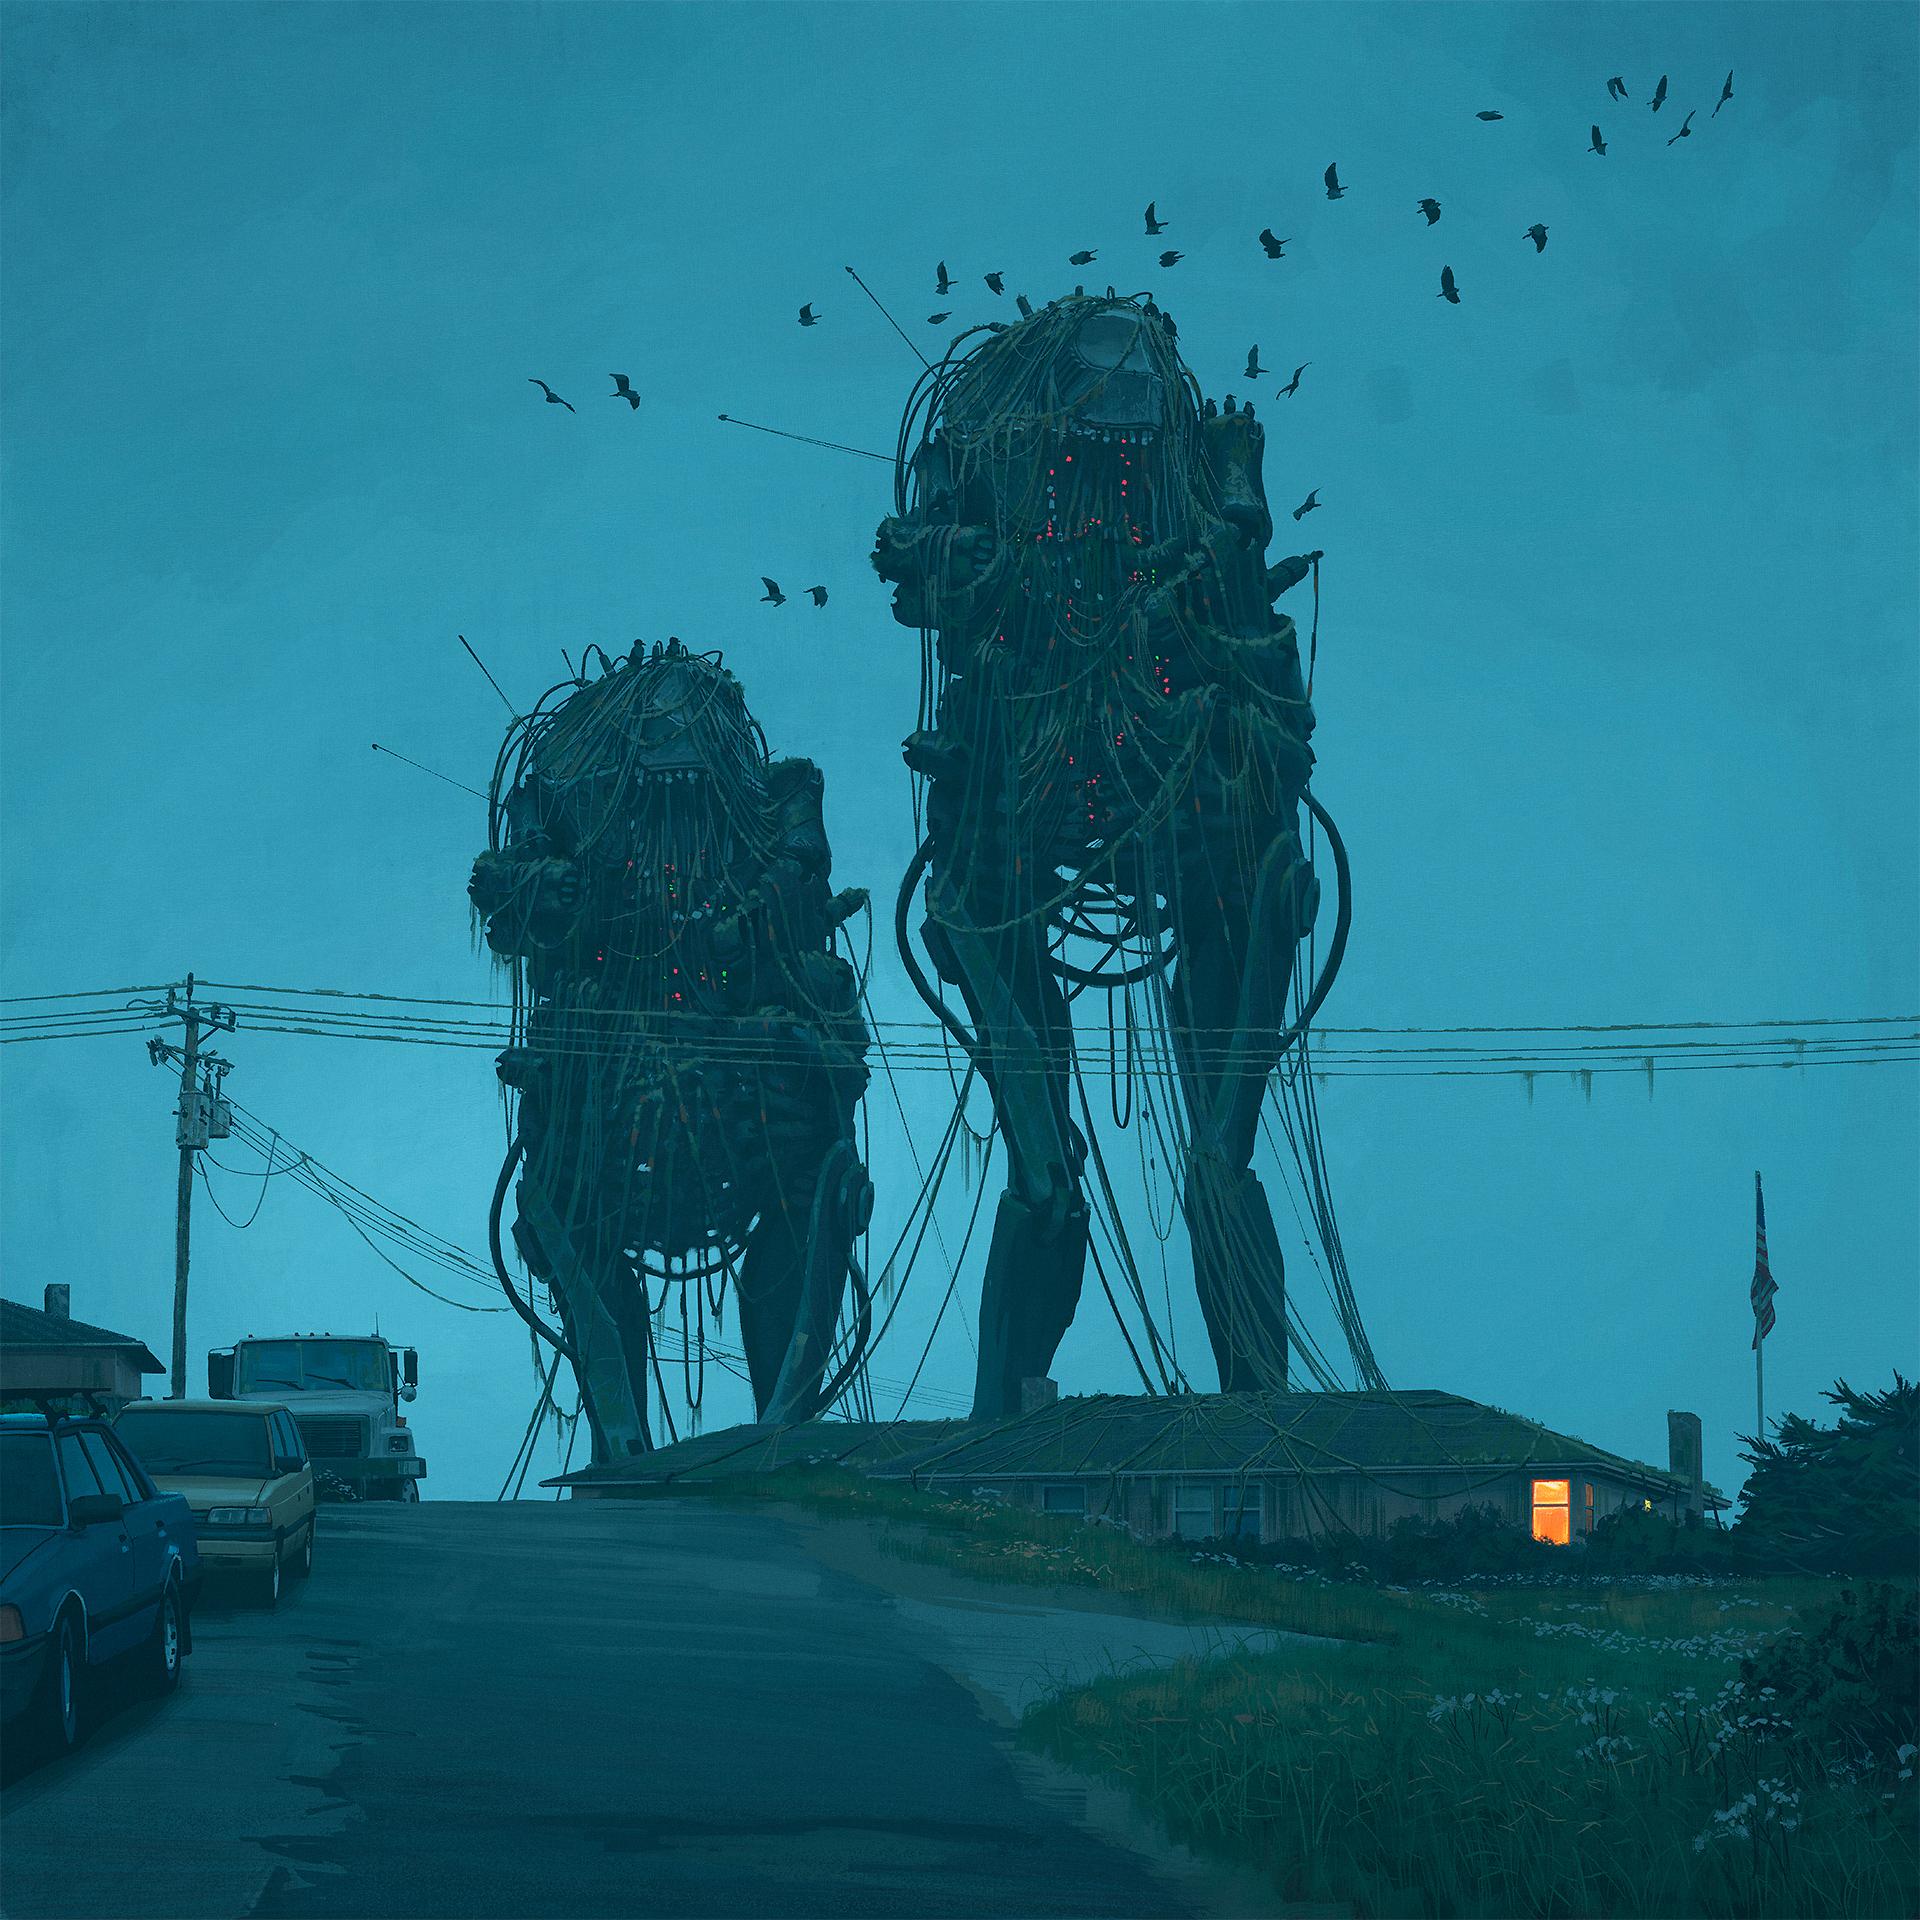 sculptures-simon-stalenhag